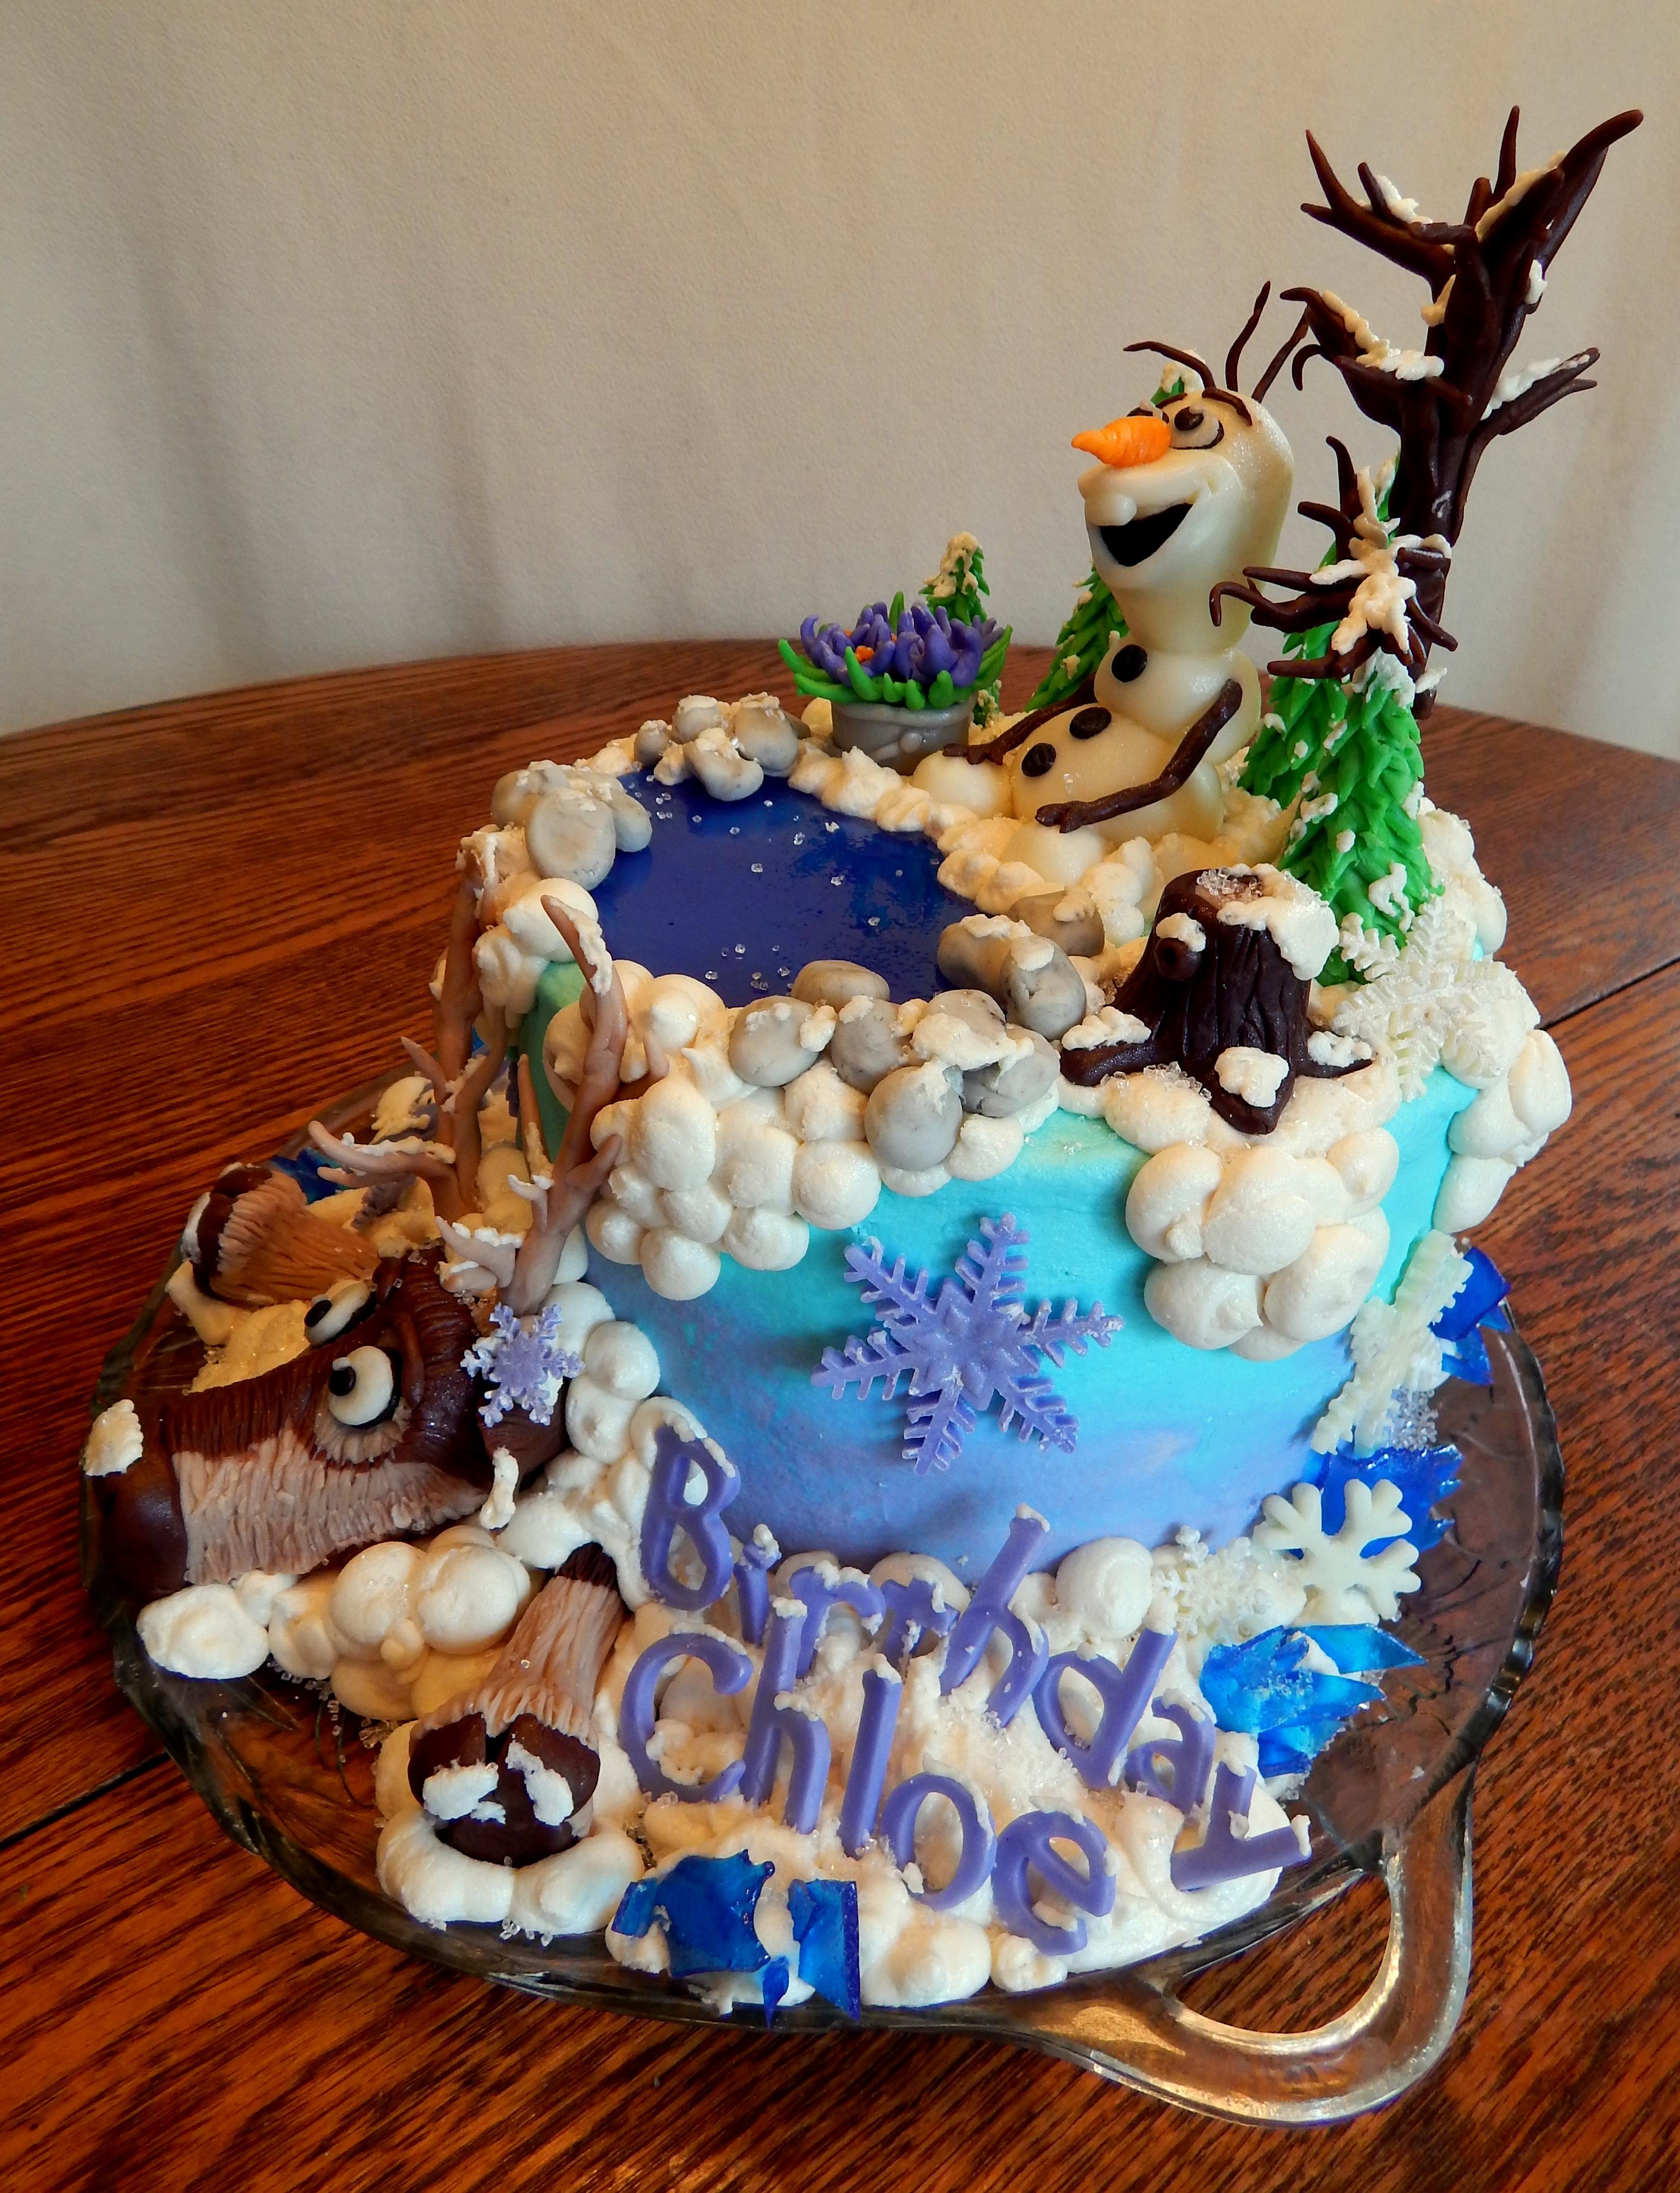 Cake Decoration Olaf : Frozen Olaf And Sven Cake - CakeCentral.com